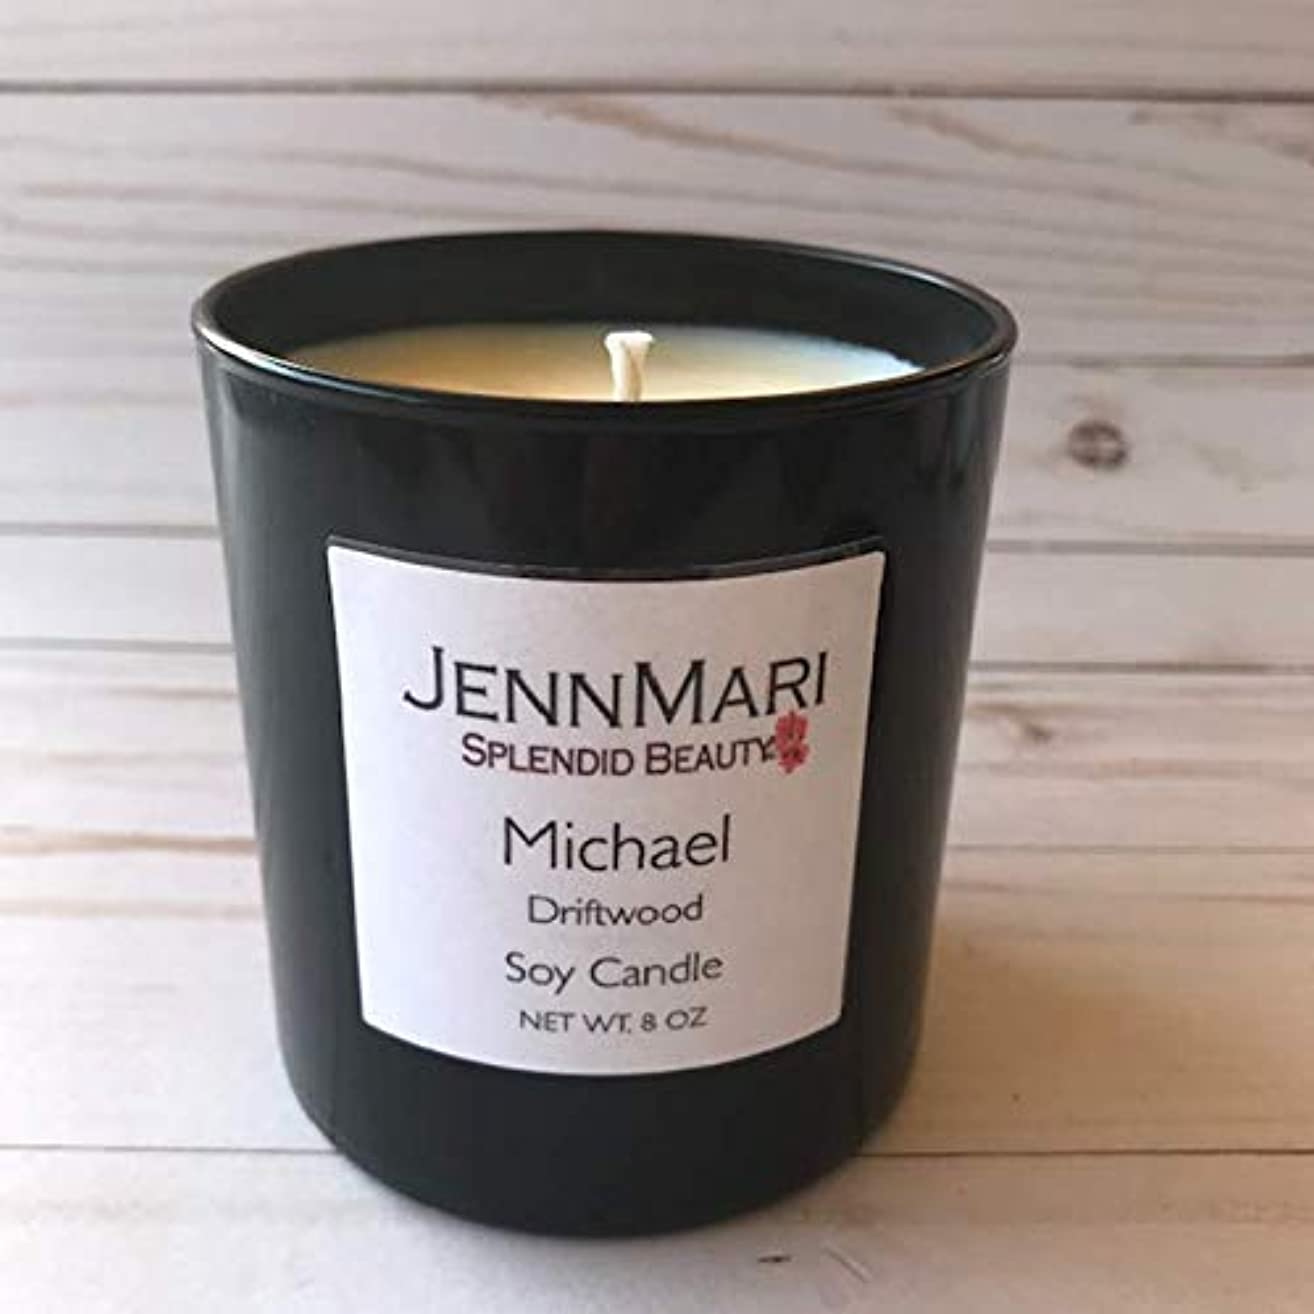 Splendid Beauty   Driftwood Scented Soy Candle Glass Jar   10 Oz   Handmade   Eco-friendly   Vegan   Cotton Wick   100% Soy Wax